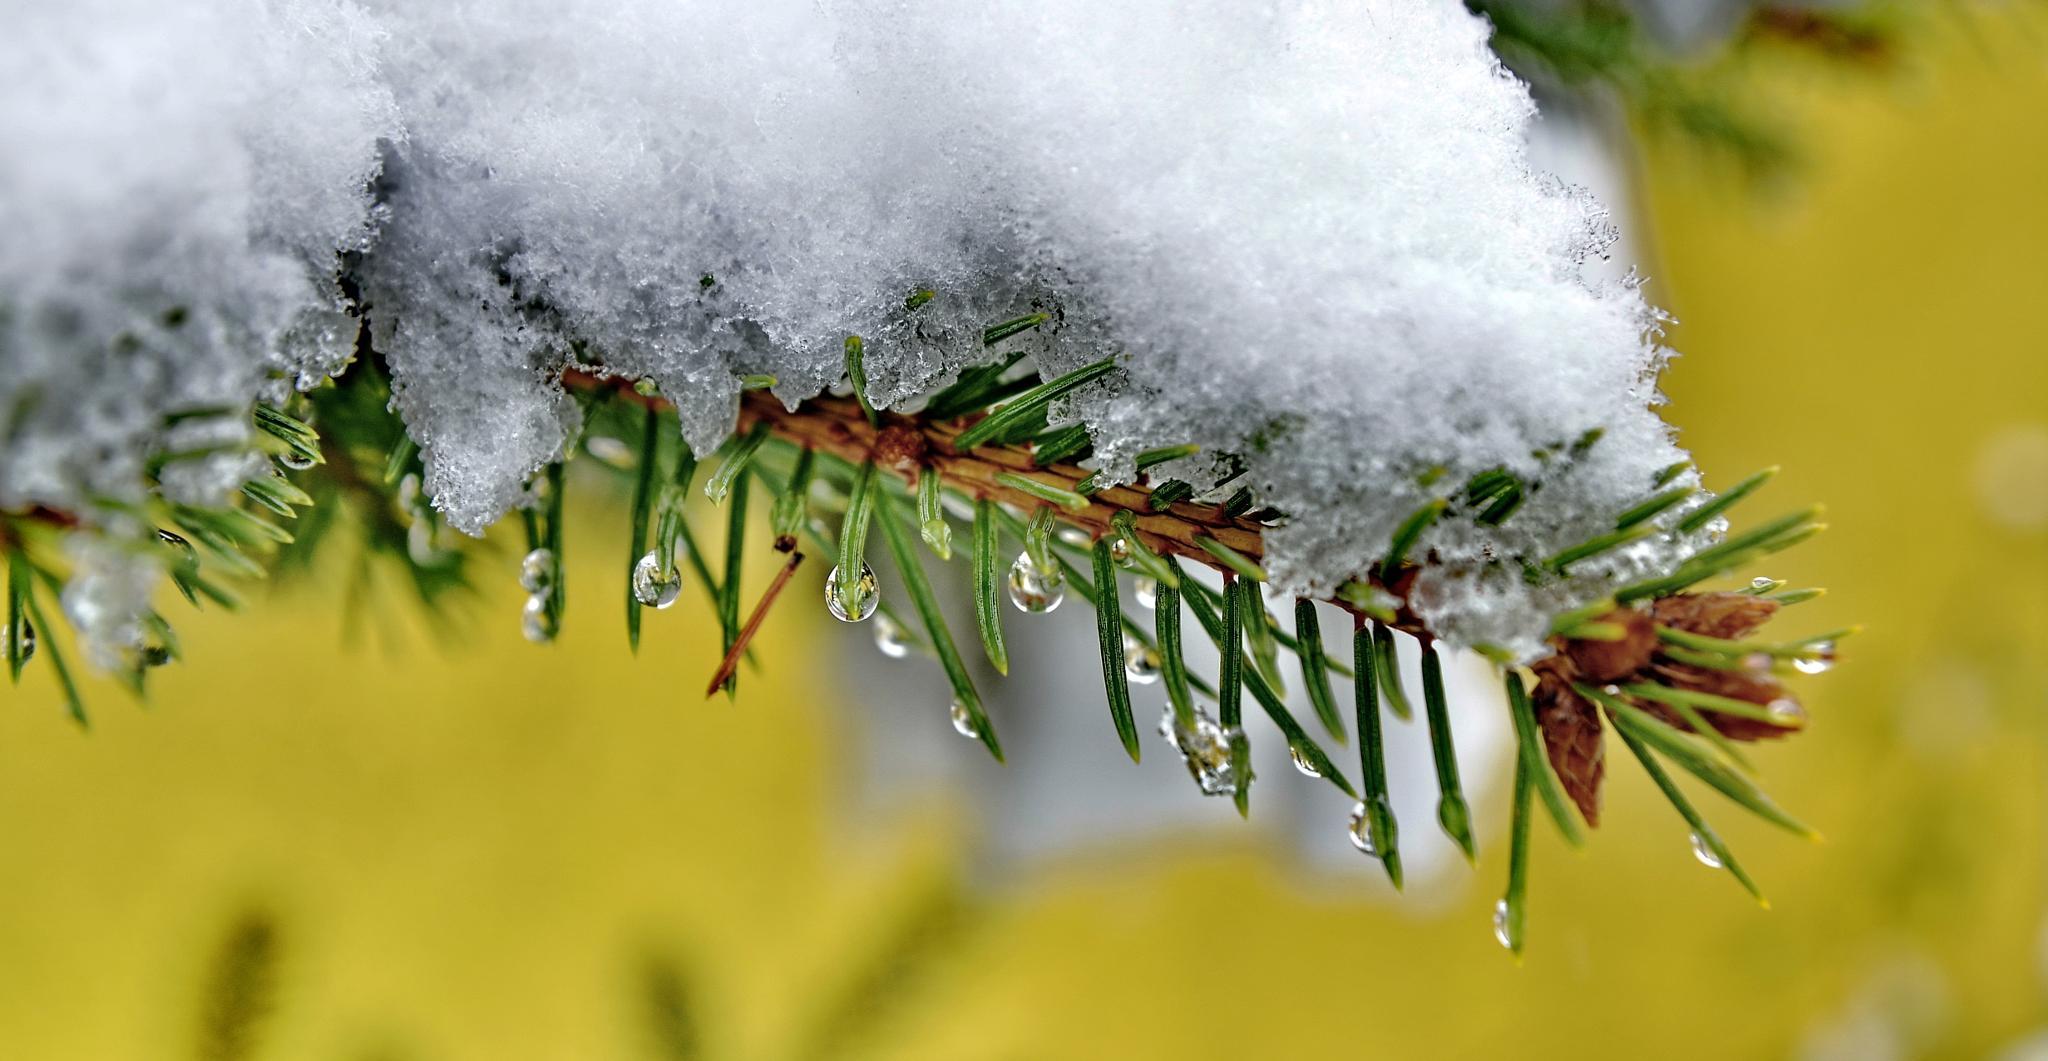 snow & drop by edyctin